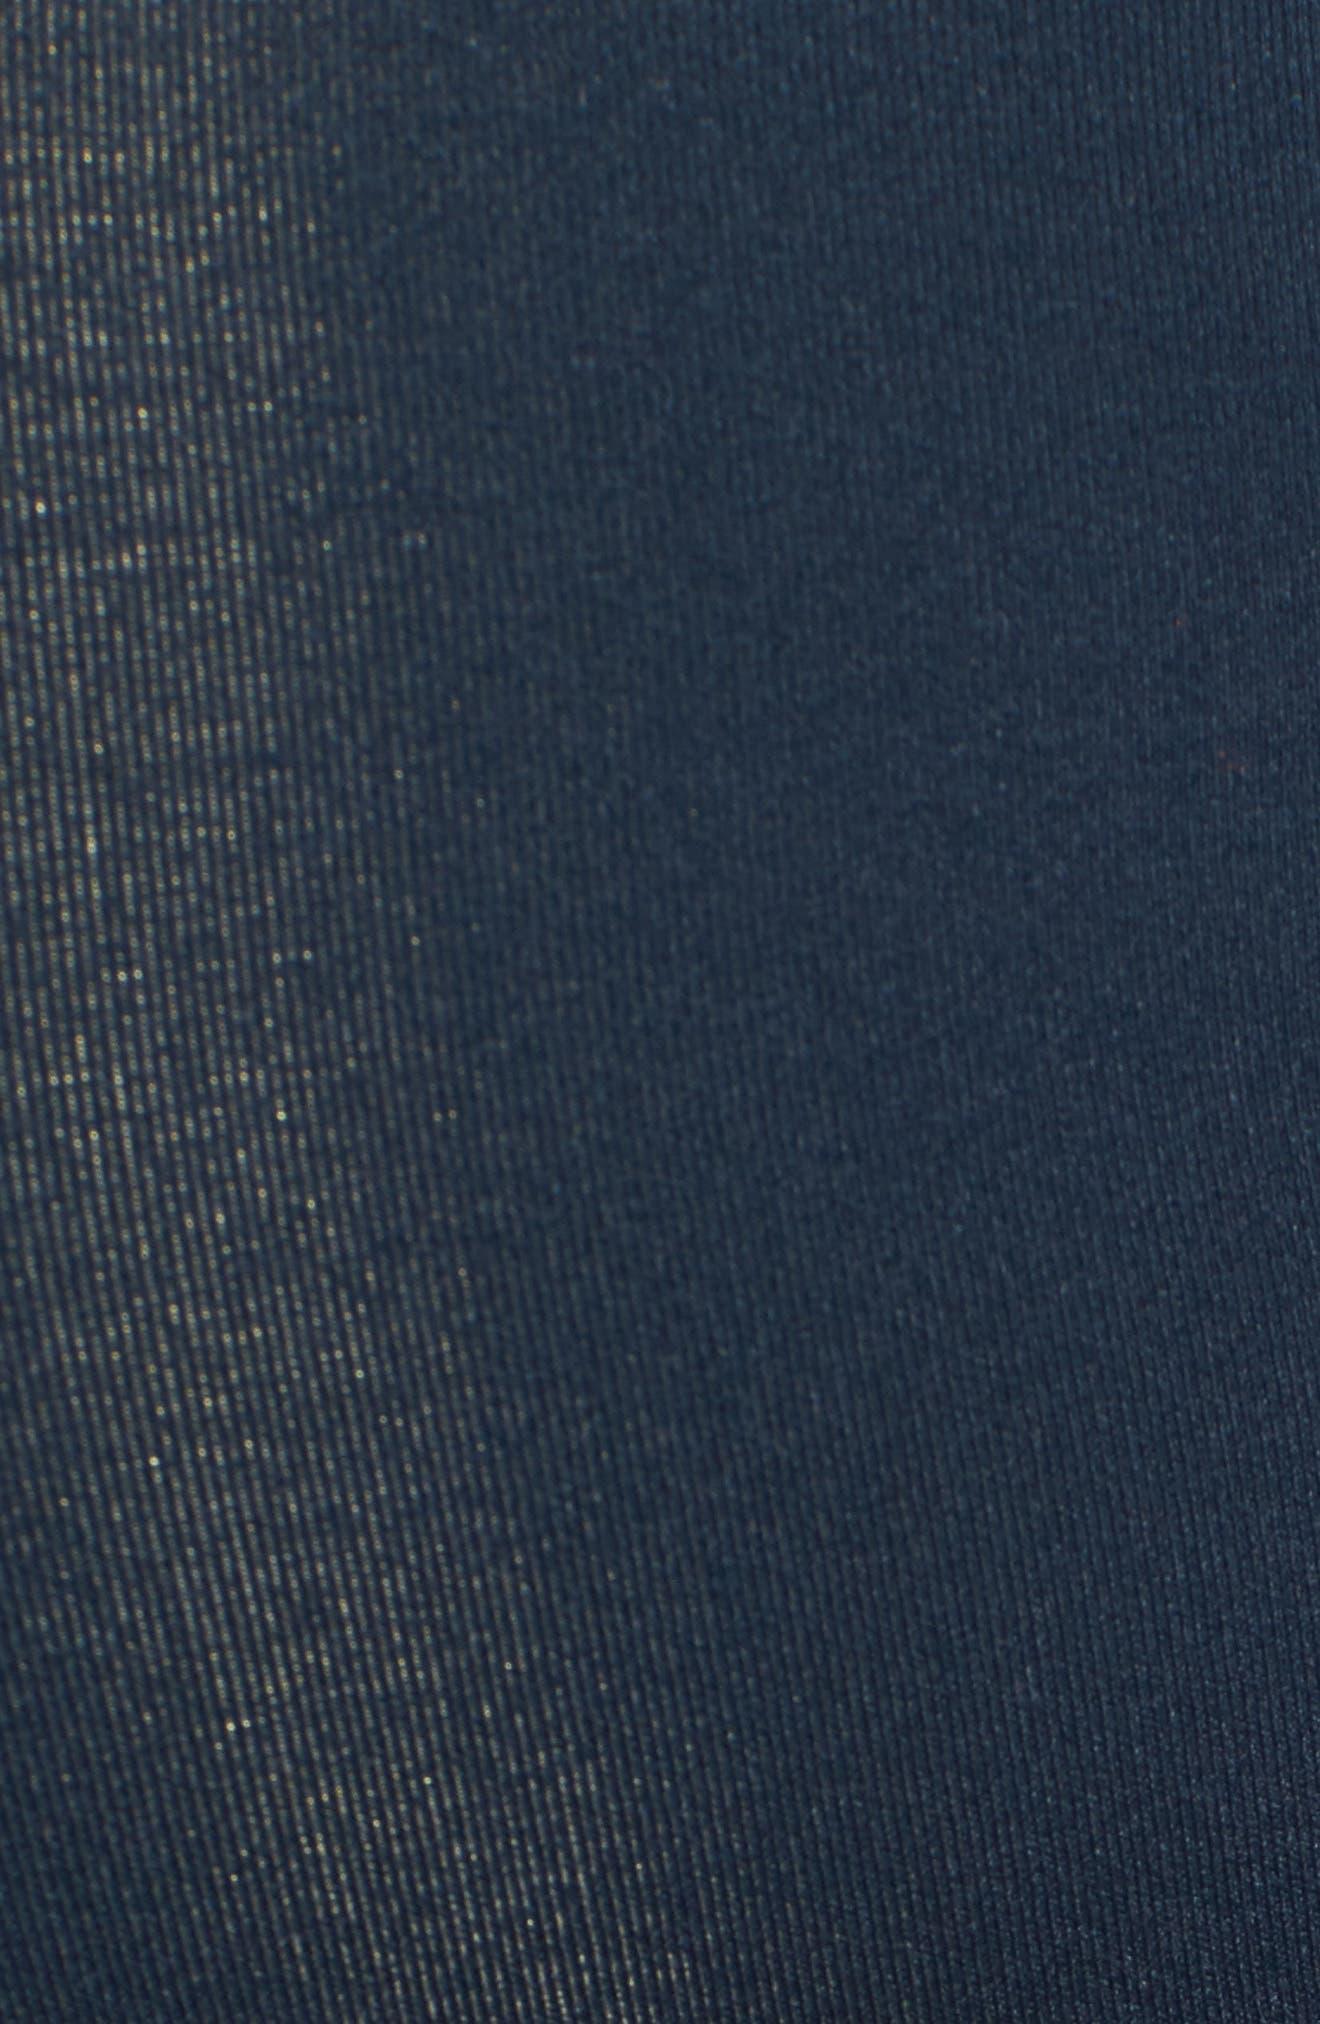 Butter Maternity Skinny Jeans,                             Alternate thumbnail 5, color,                             400